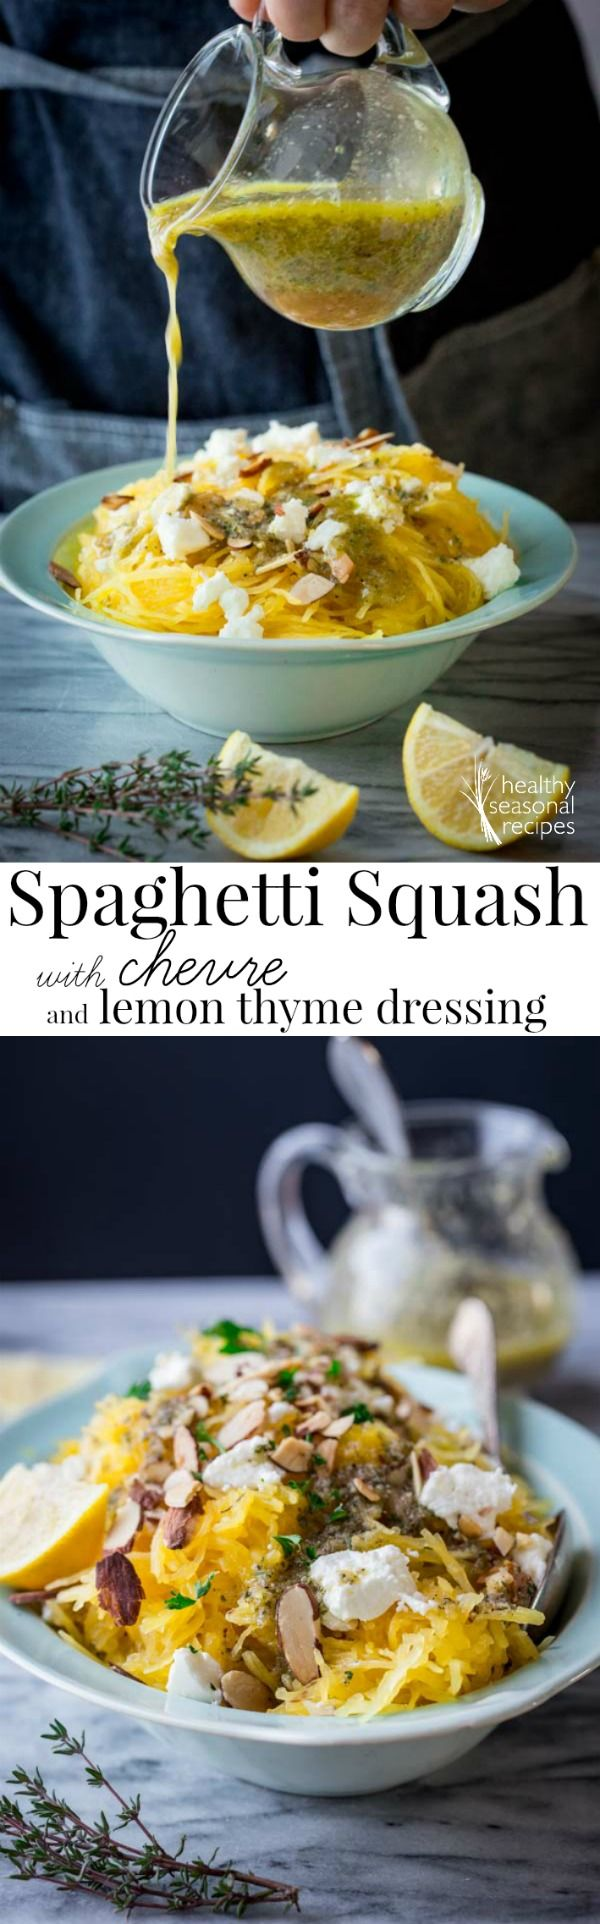 667 best healthy seasonal recipes images on pinterest seasonal spaghetti squash with chvre and lemon thyme dressing the lemonsdinner recipespaleo forumfinder Gallery